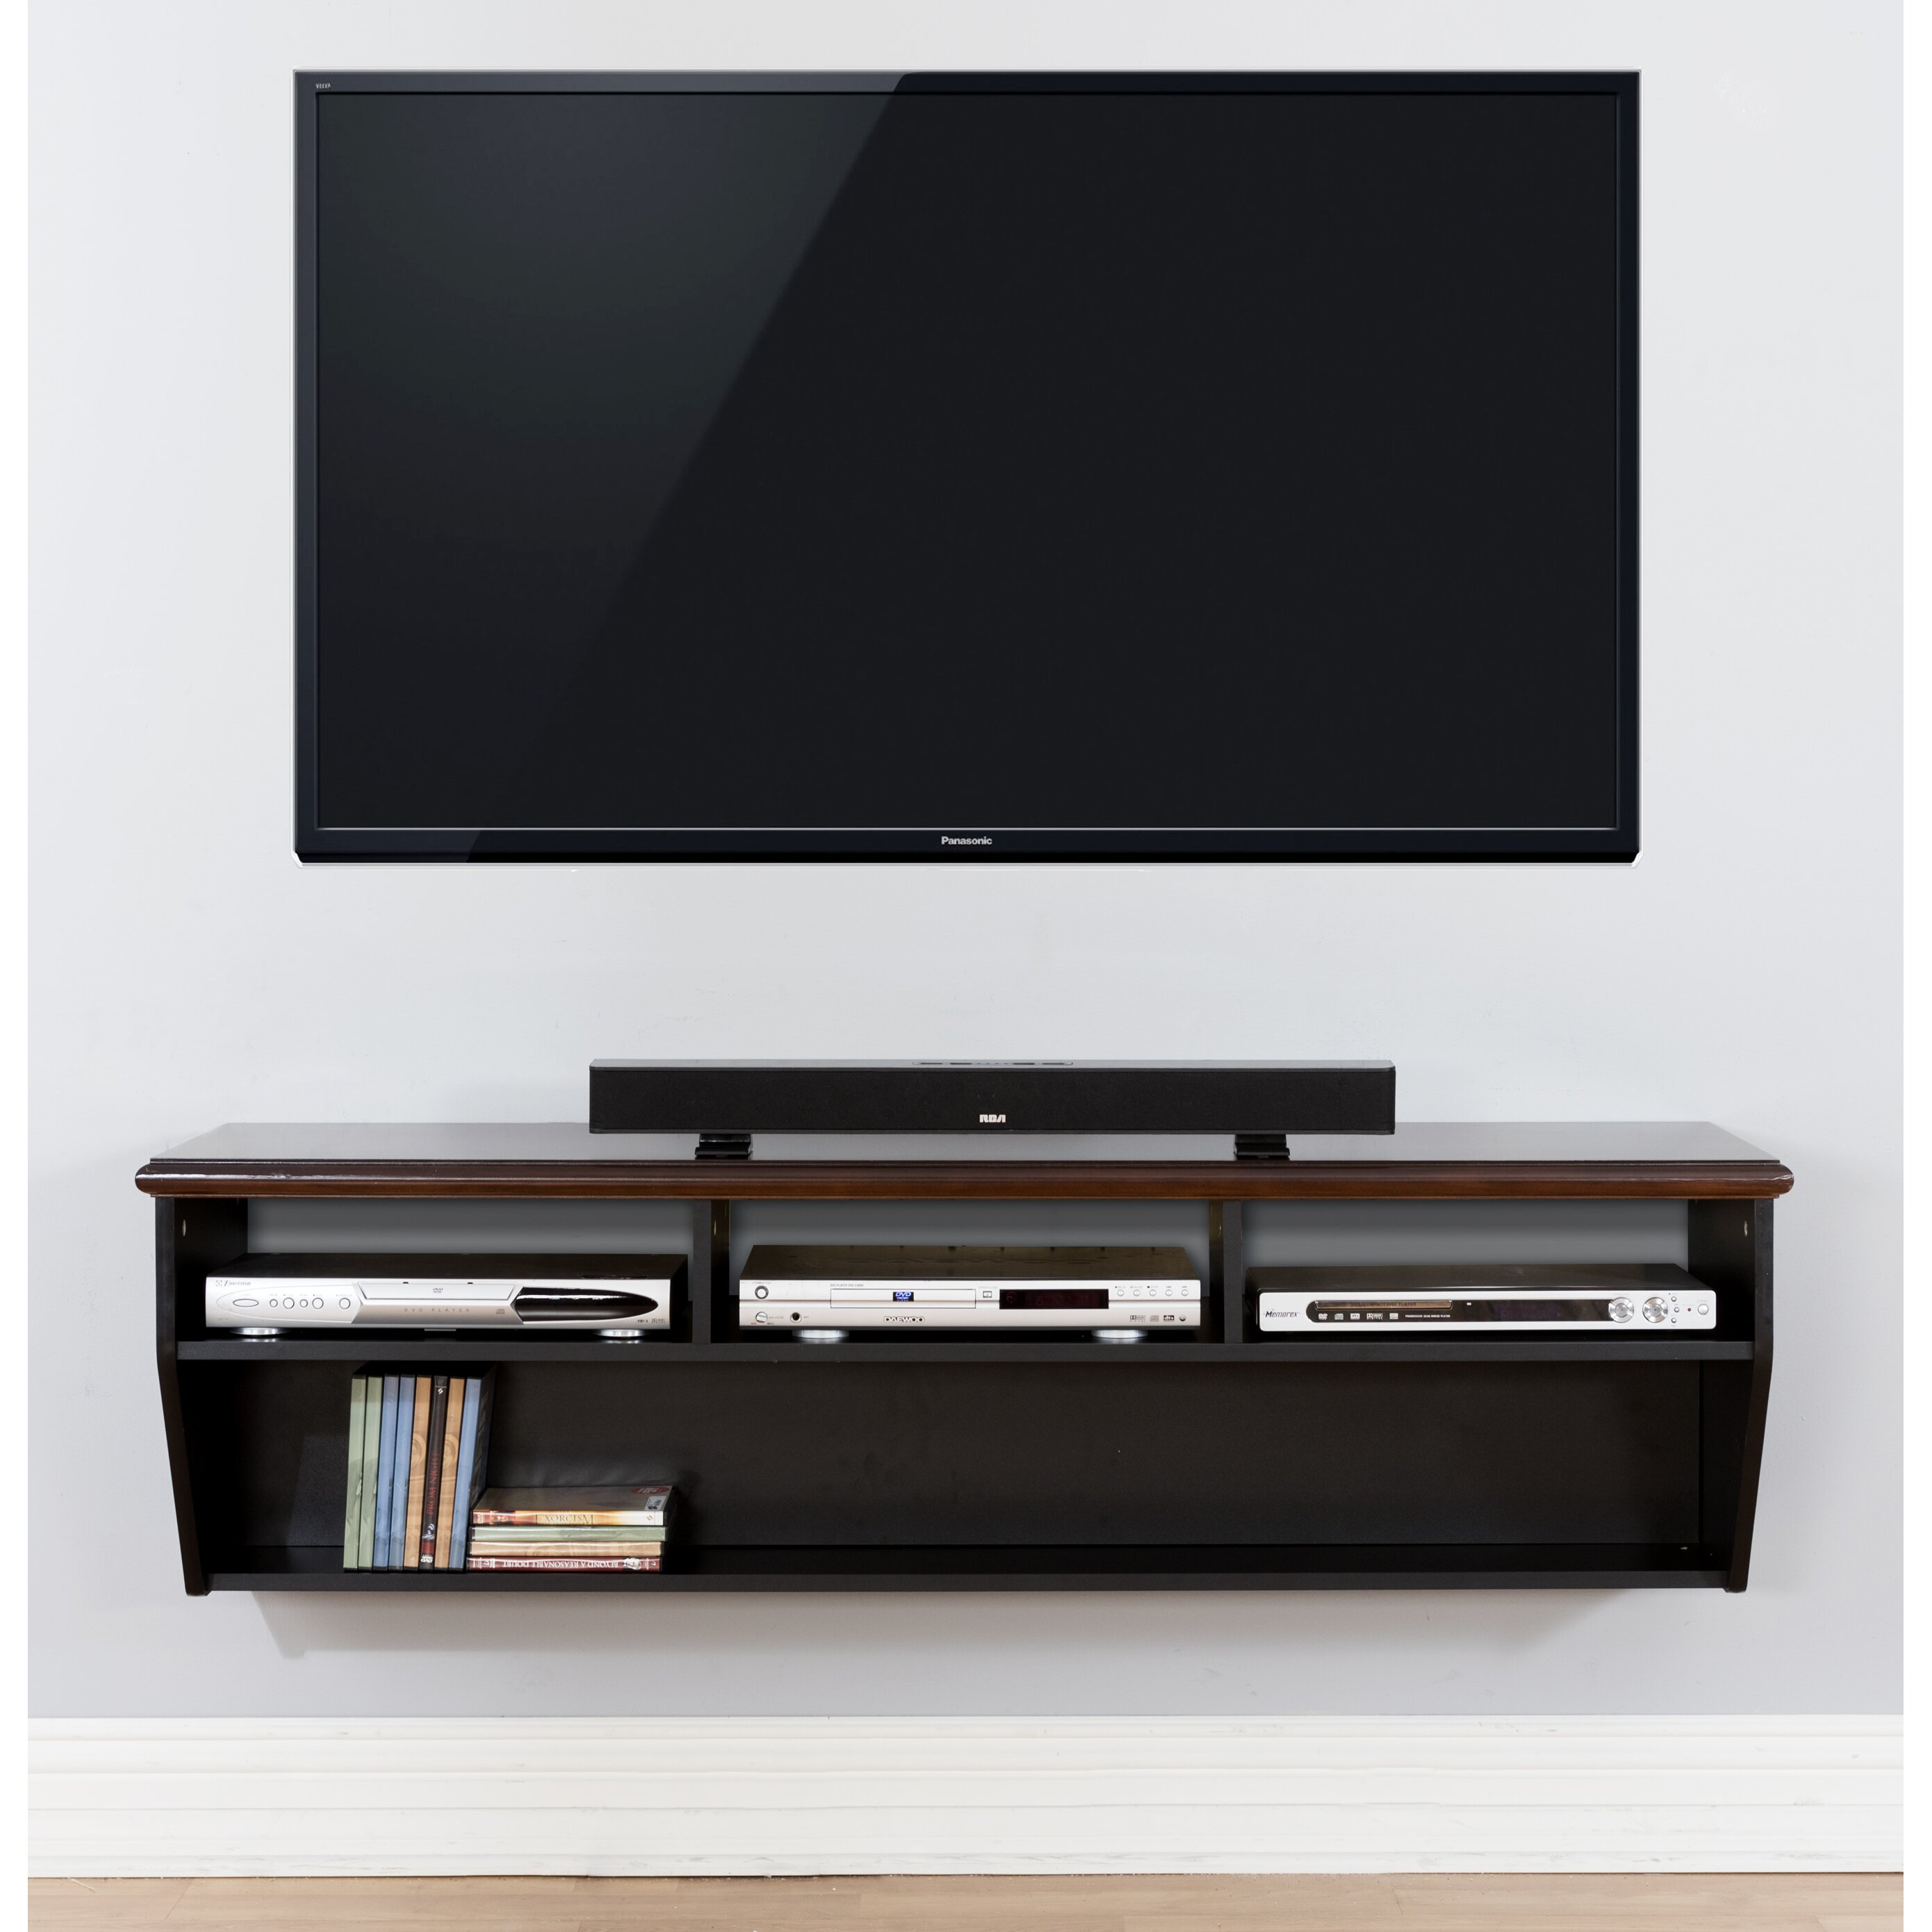 60 hardwood veneer top wall mounted tv component shelf. Black Bedroom Furniture Sets. Home Design Ideas